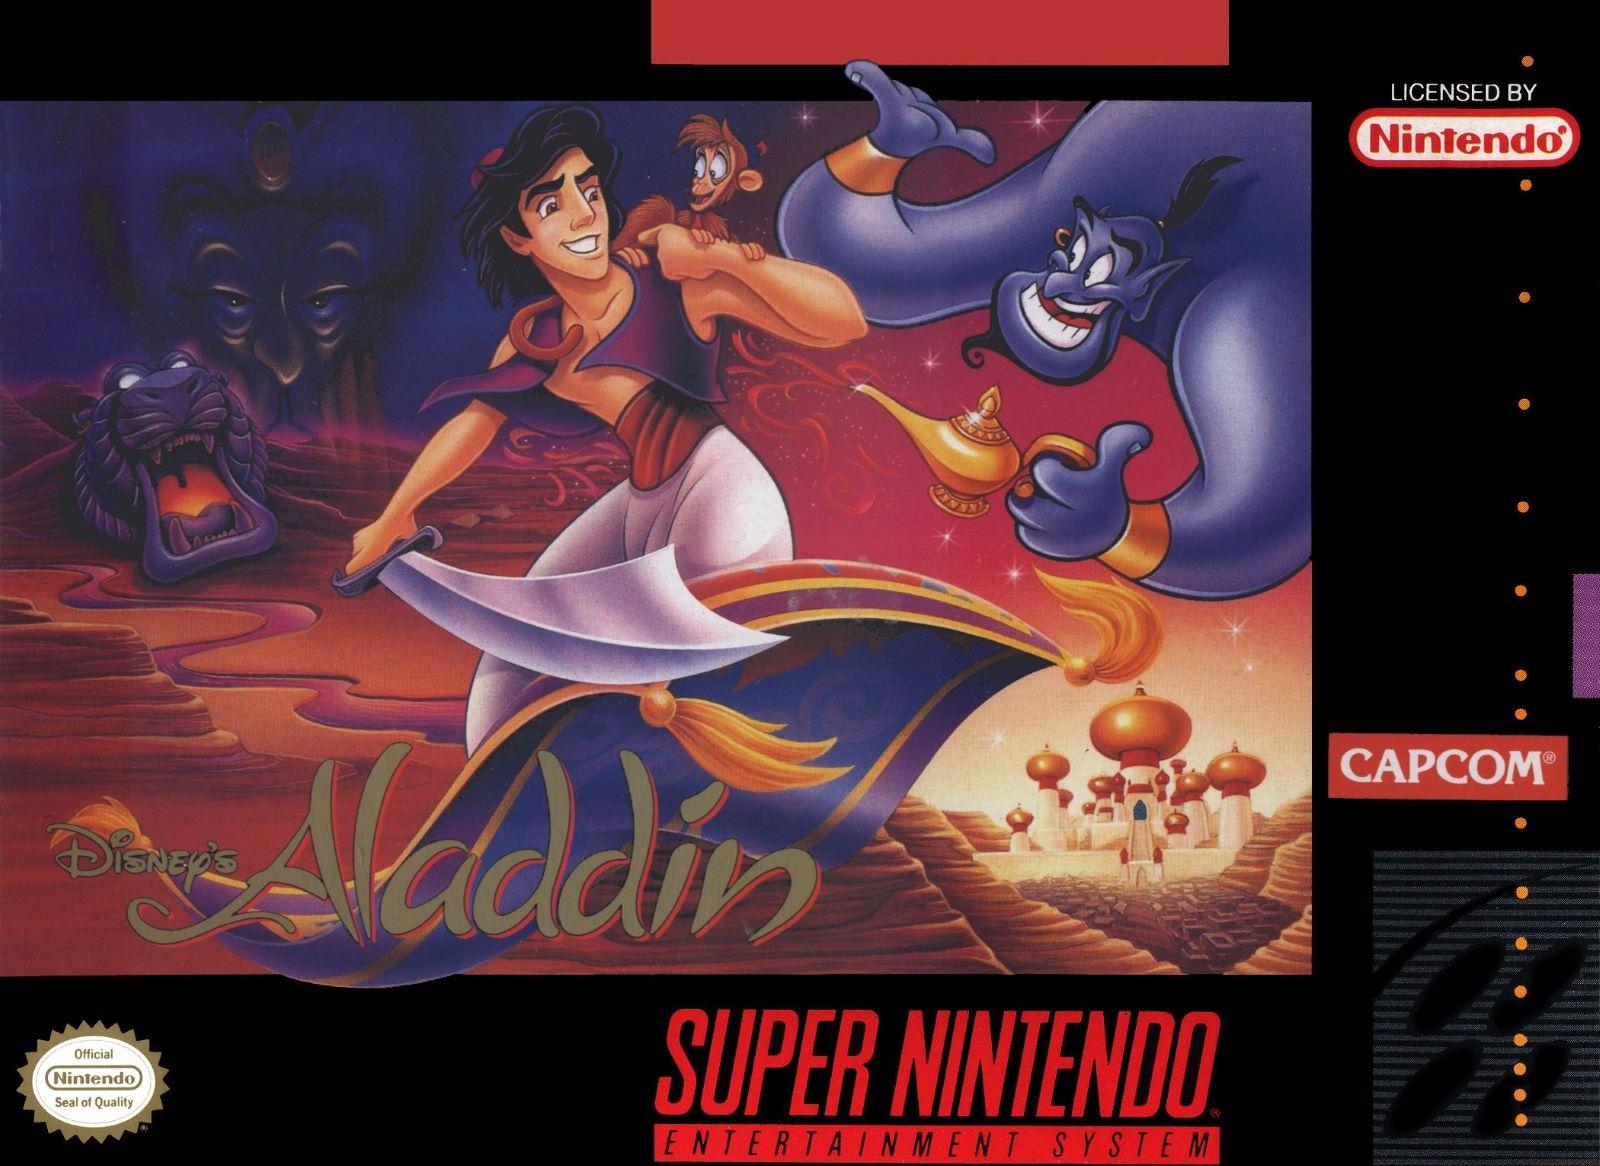 Disney's Aladdin SNES Super Nintendo